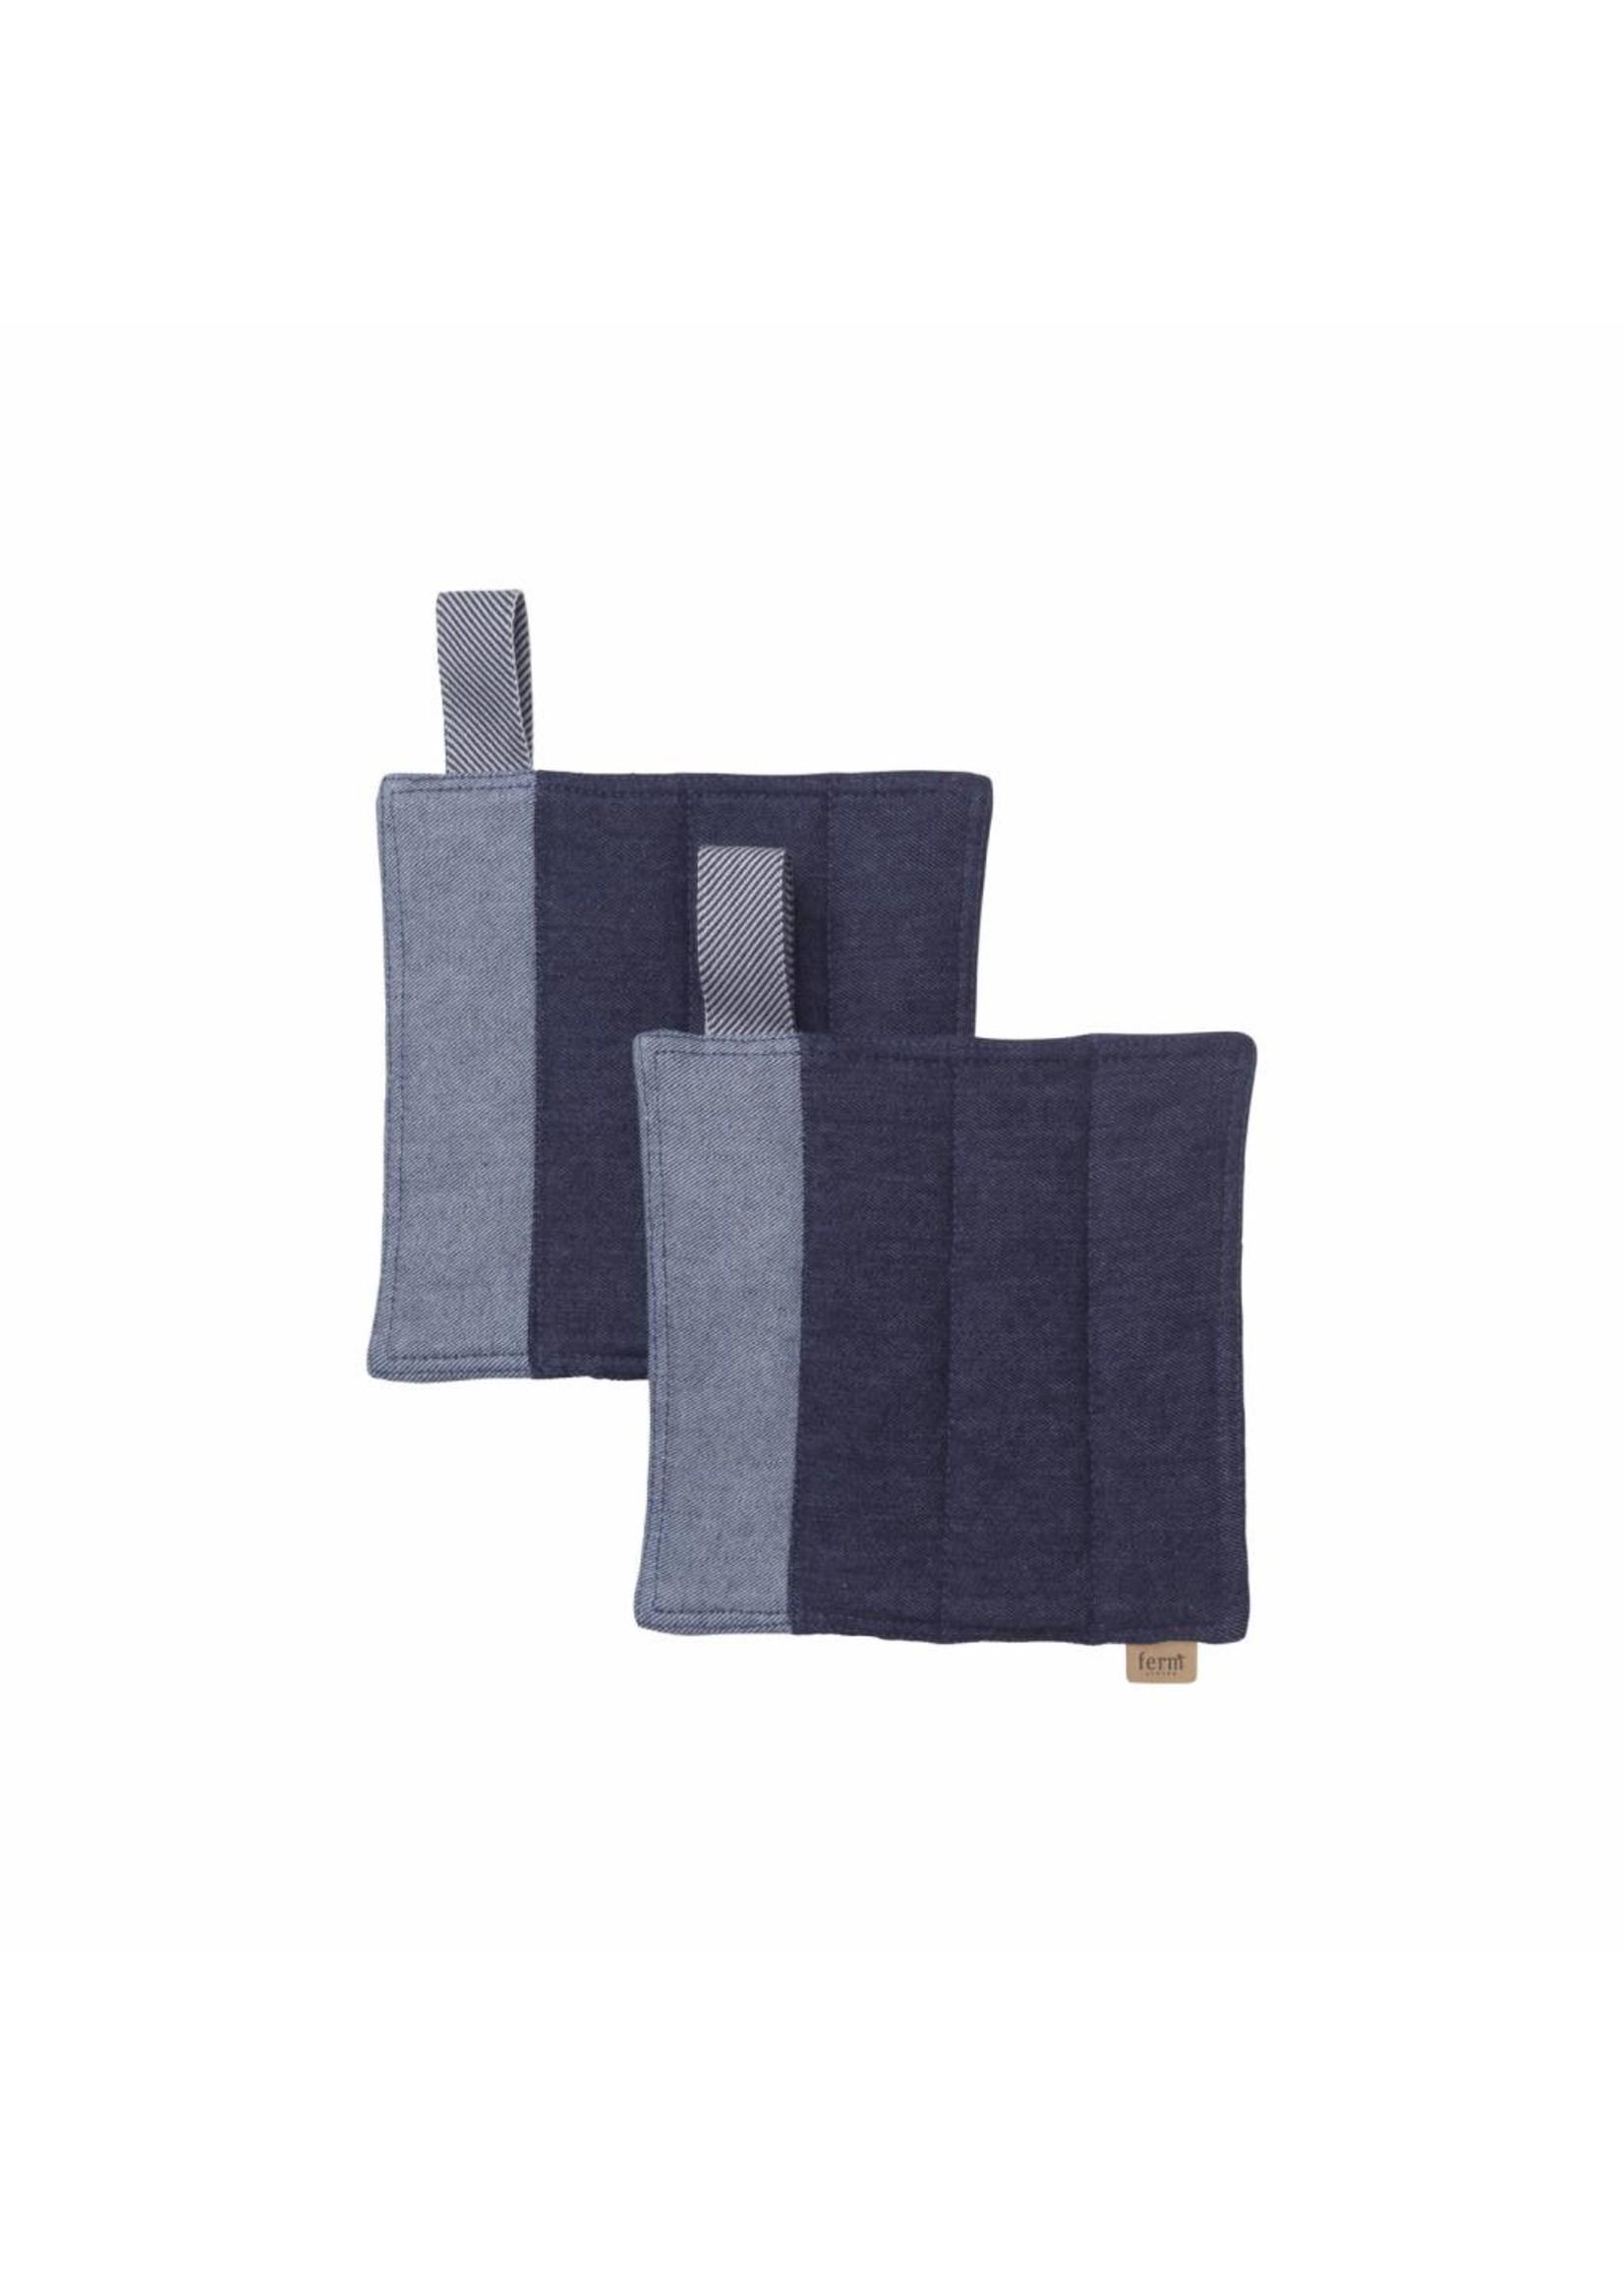 ferm LIVING ferm LIVING Denim Pot Holders - Set of 2 - Blue